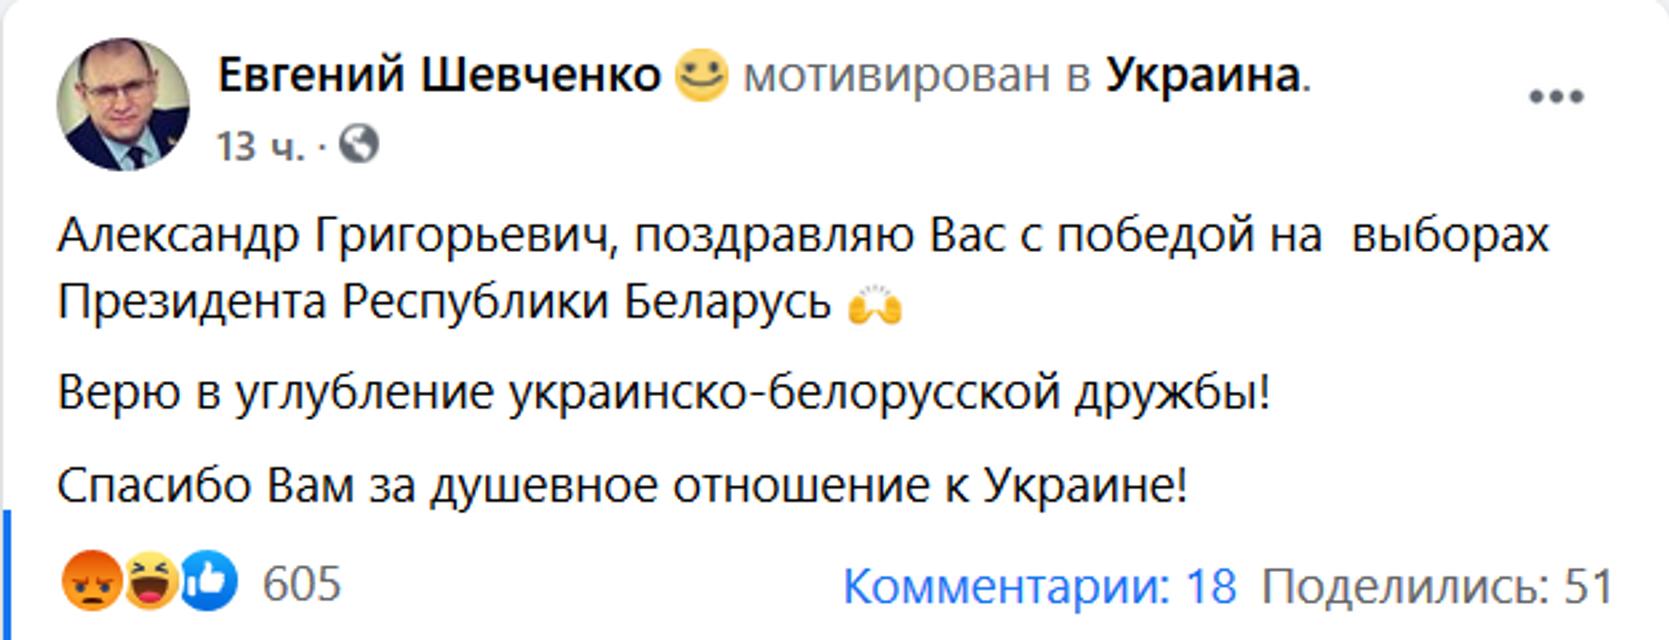 'Слуга народа' поздравил Лукашенко с победой – ФОТО - фото 203795